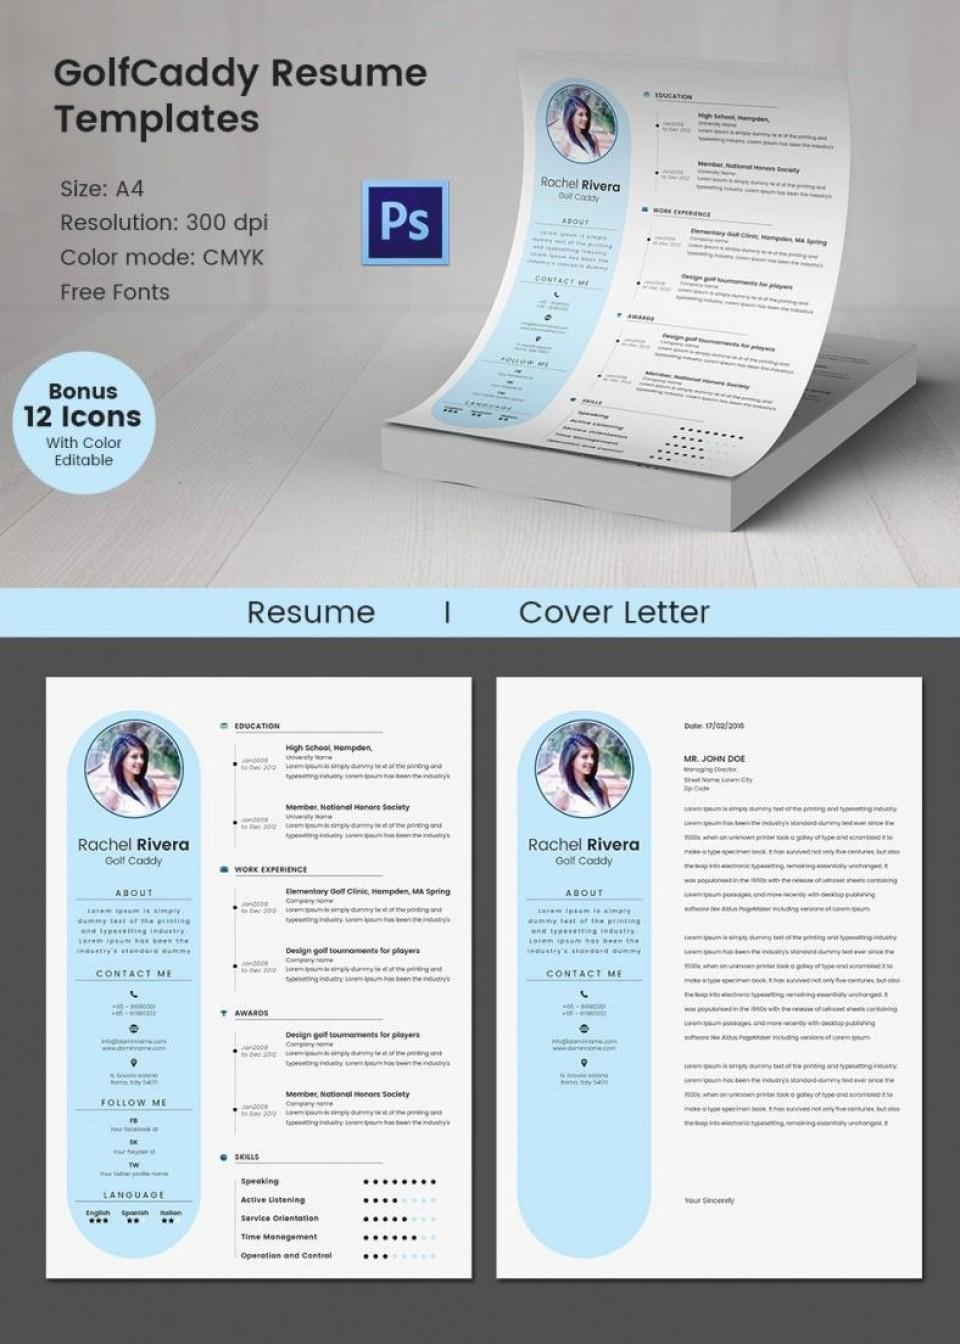 009 Excellent Software Engineering Resume Template High Def  Engineer Microsoft Word Cv Free Developer Download960